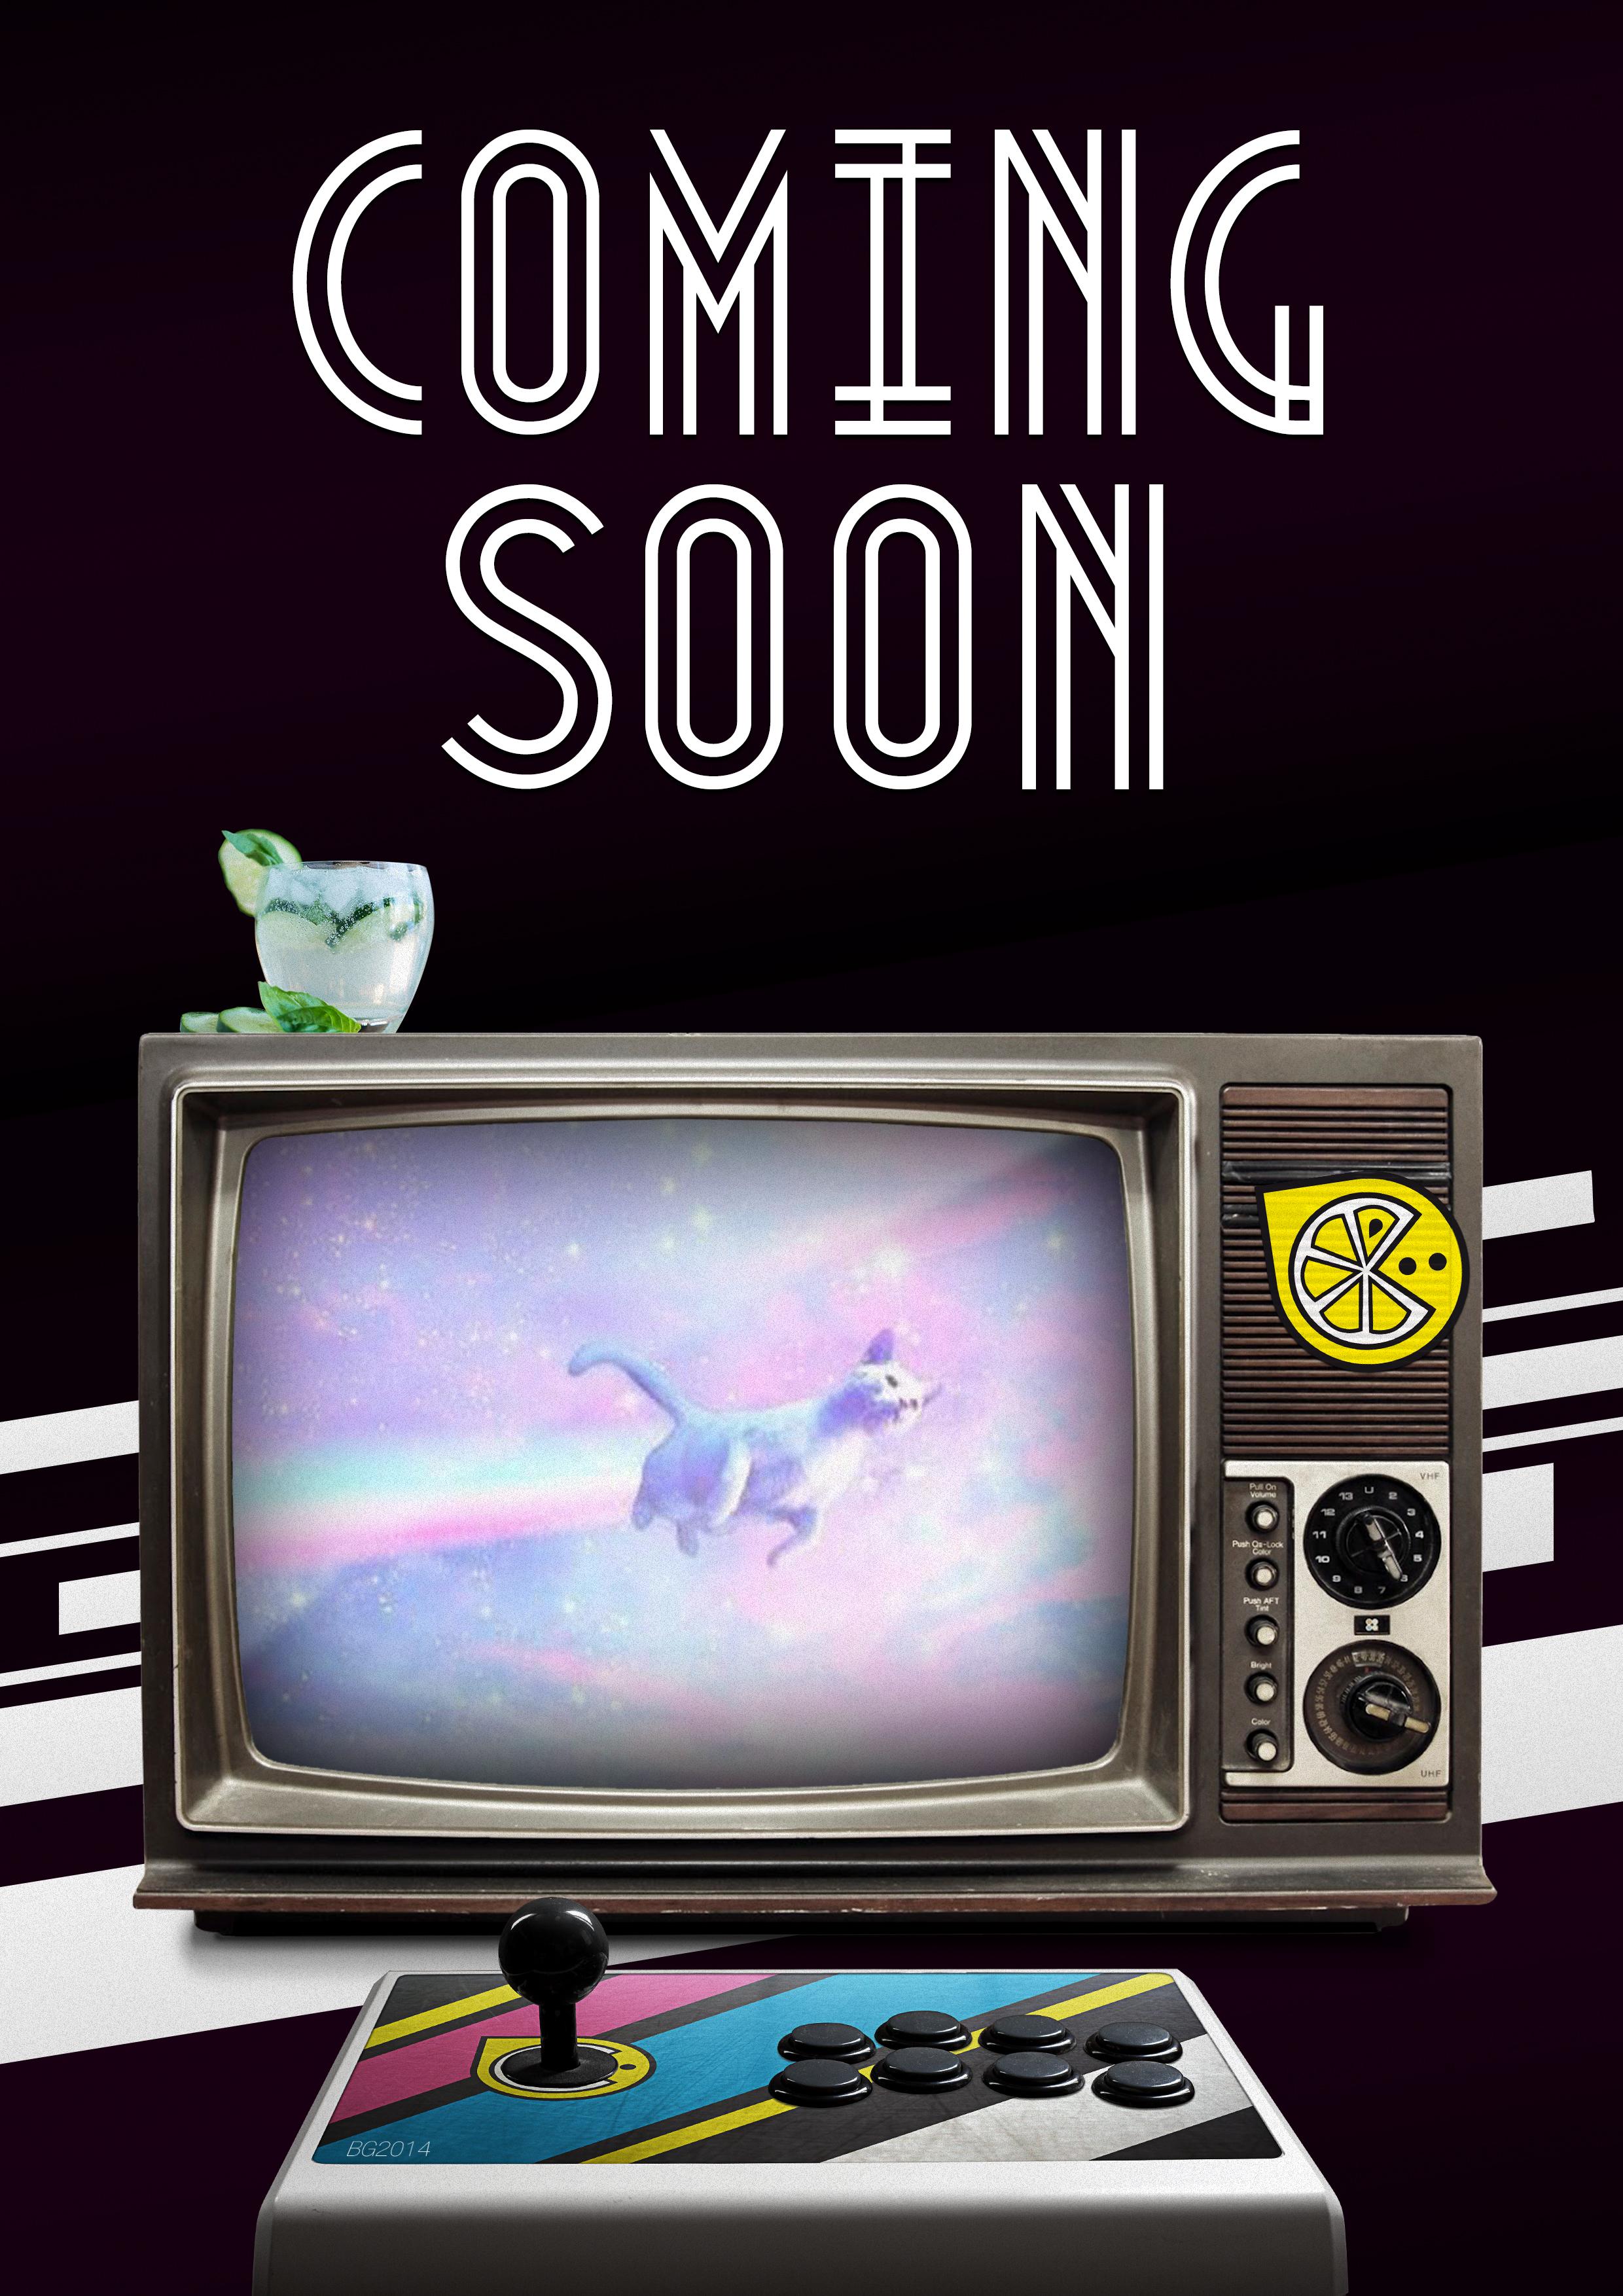 [Bargaming] Coming Soon #BG2014